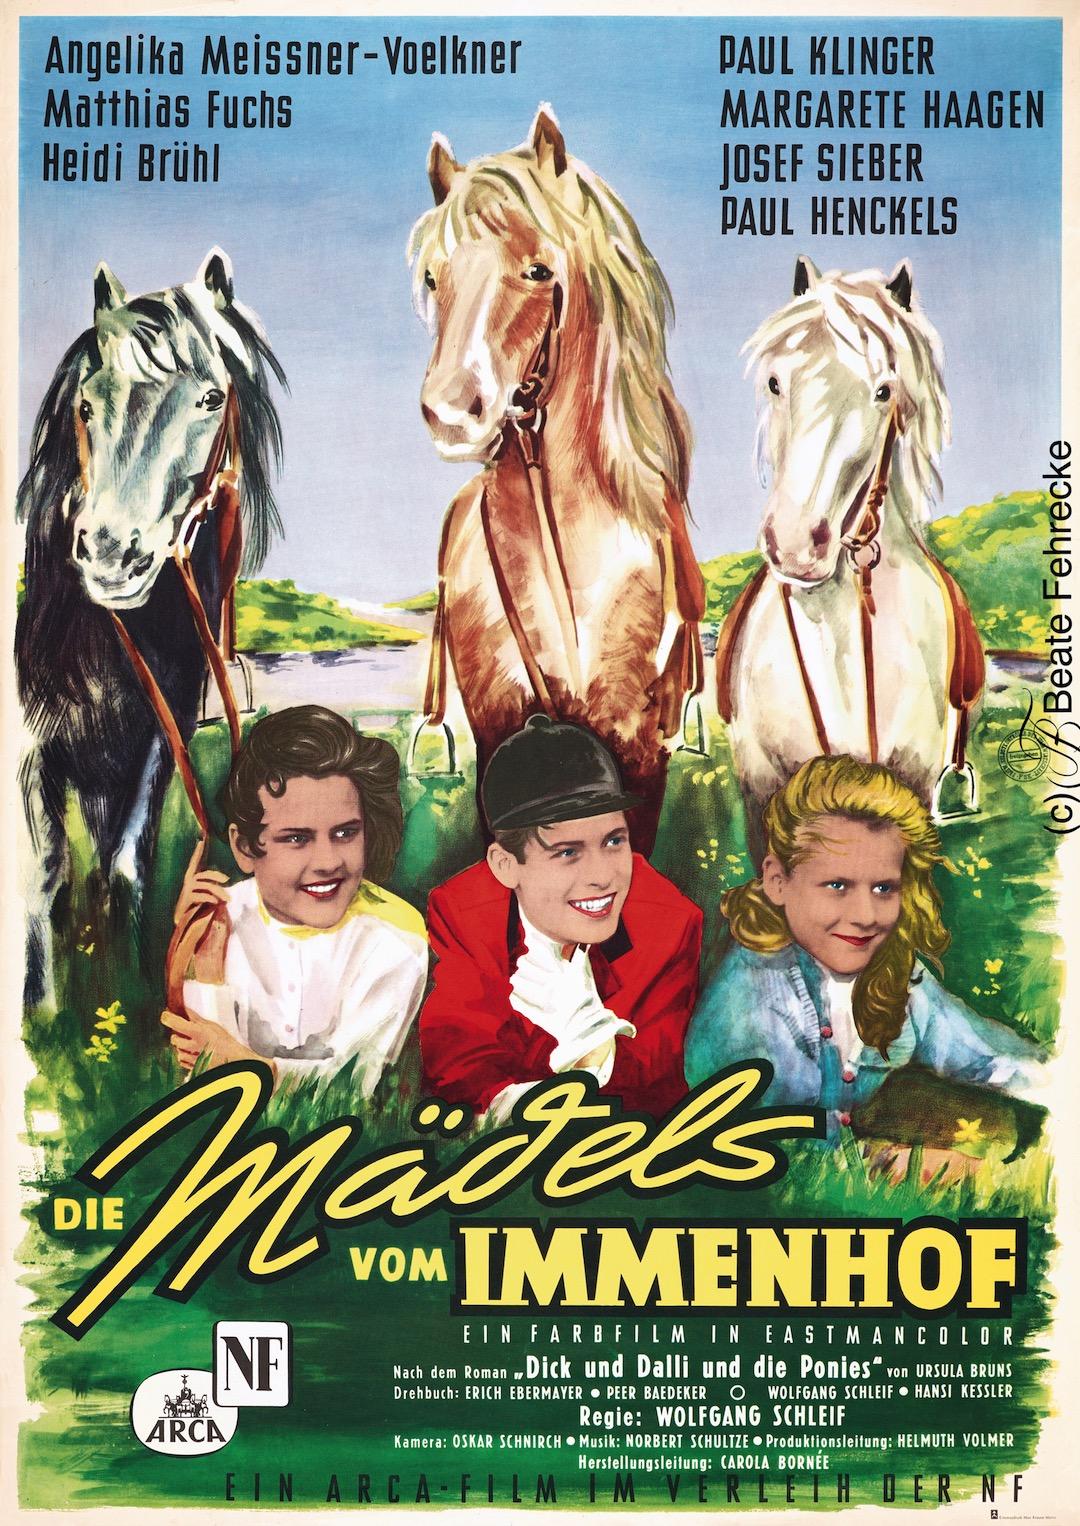 KHF Karl-Heinz Fehrecke Filmplakate, Immenhof